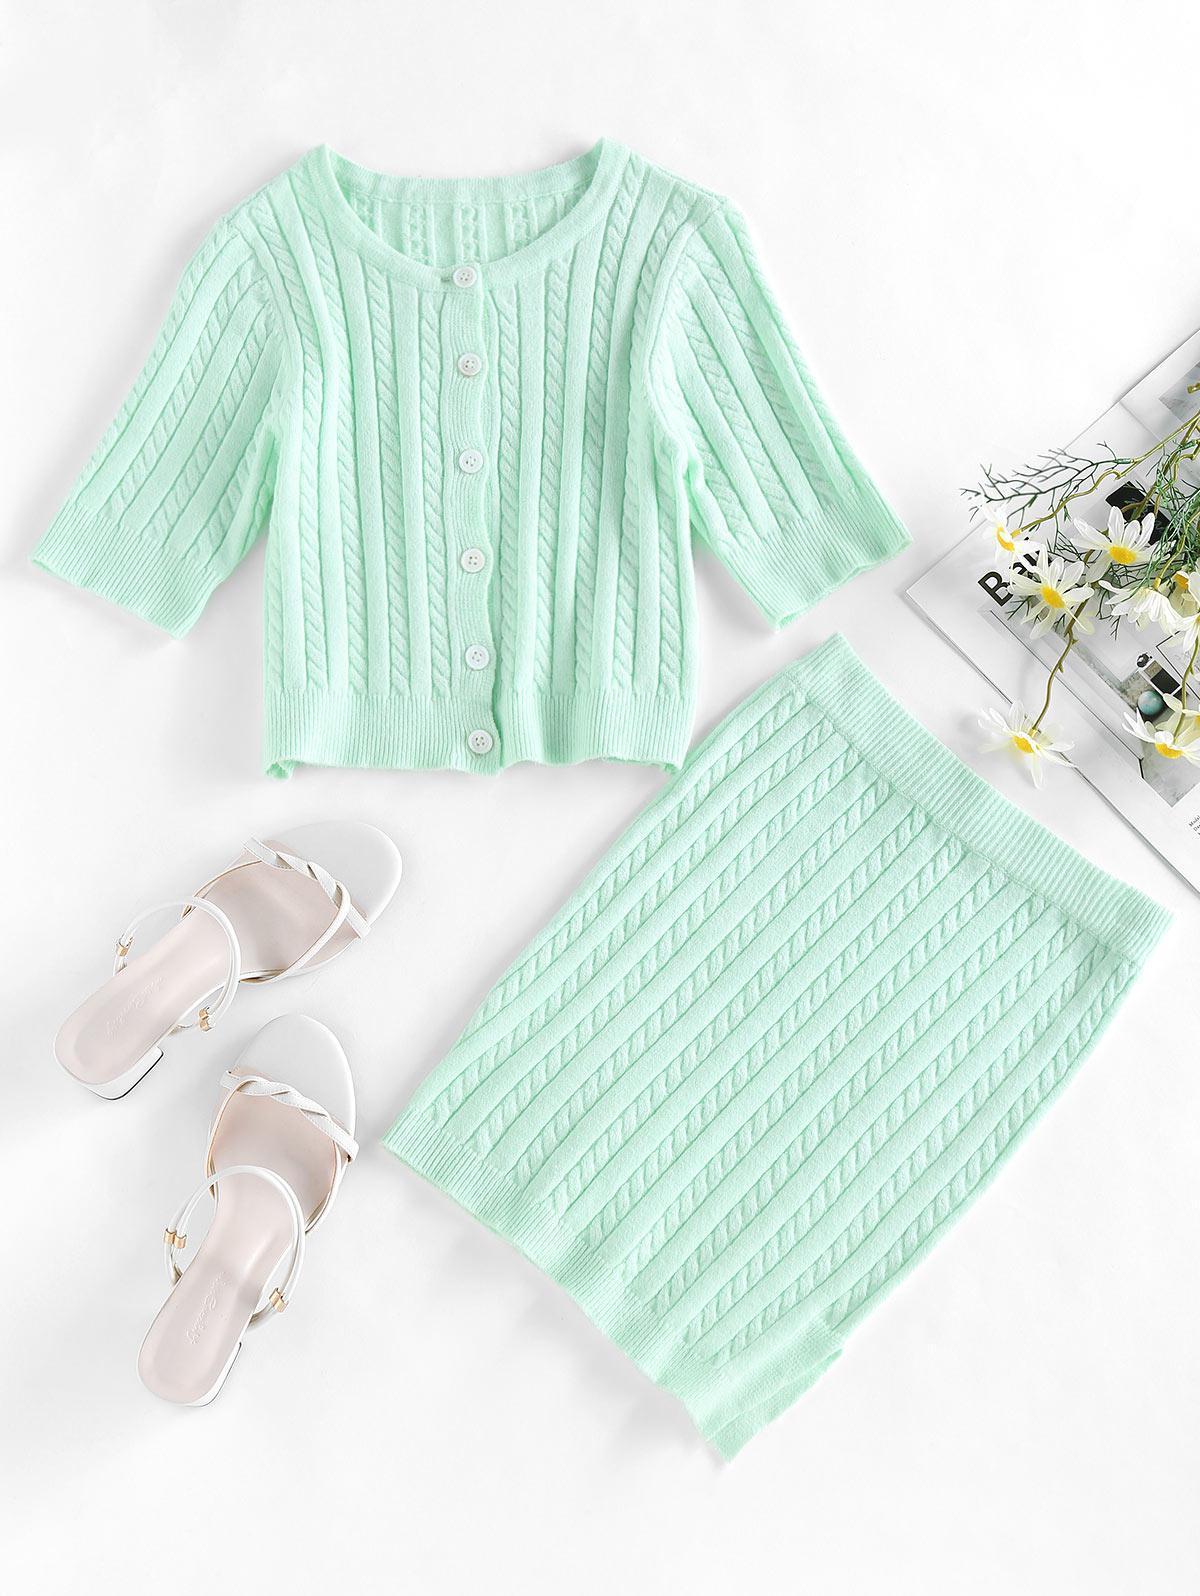 ZAFUL Cable Knit Button Up Slit Bodycon Skirt Set